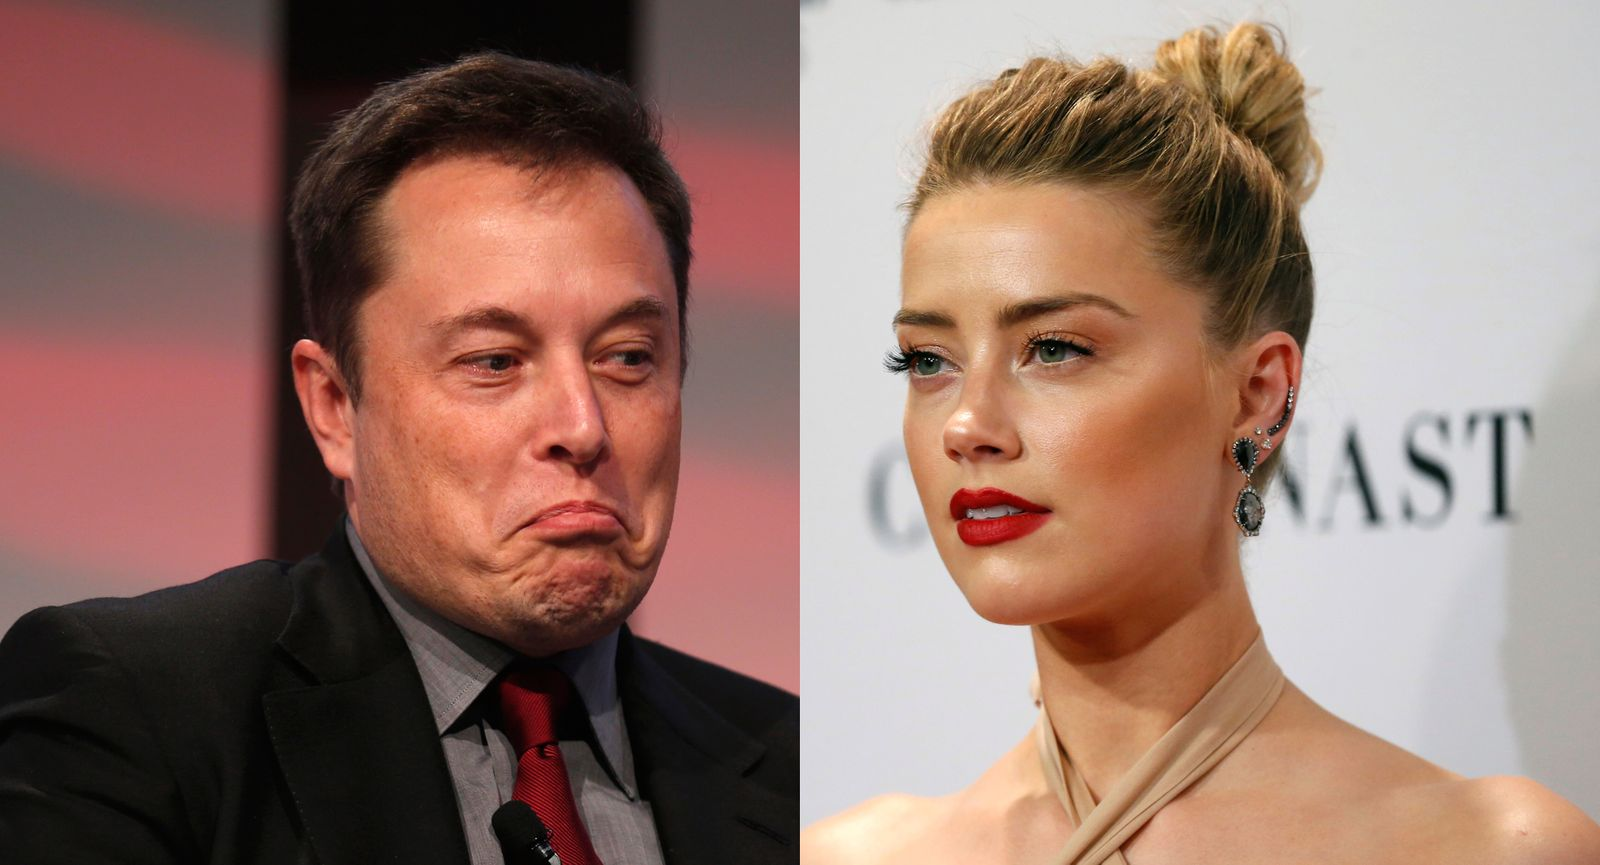 KOMBO Elon Musk / Amber Heard